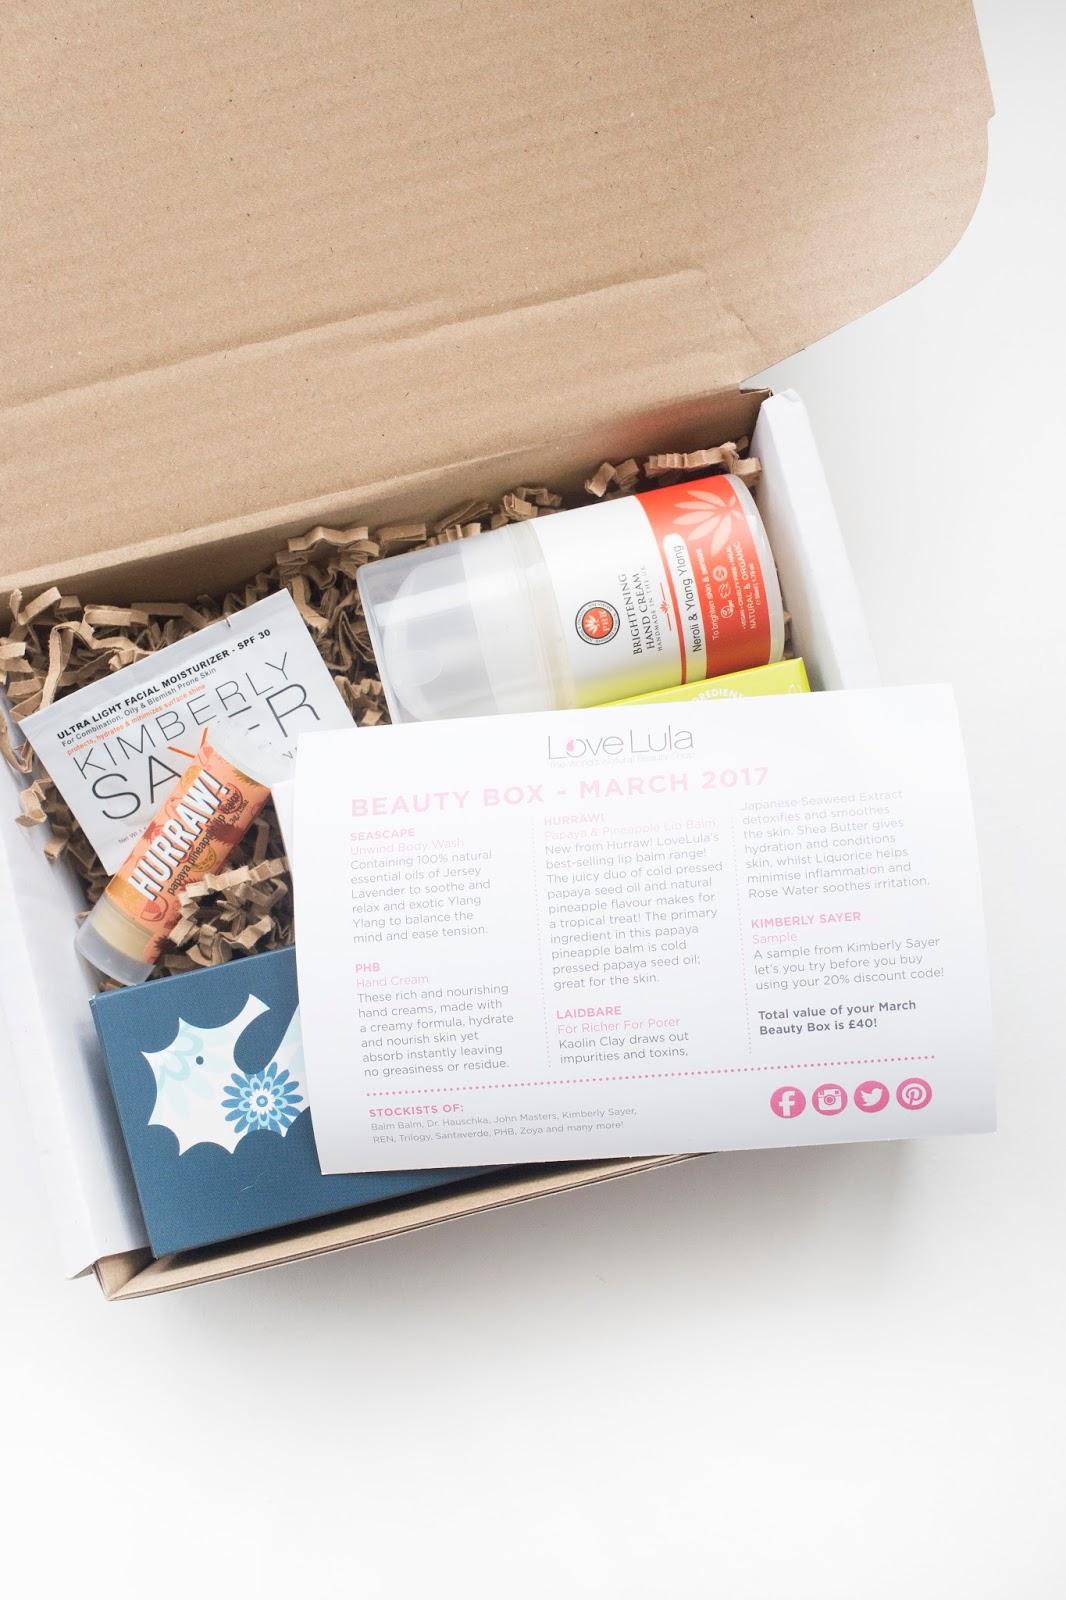 Lovelula Beauty Box | March